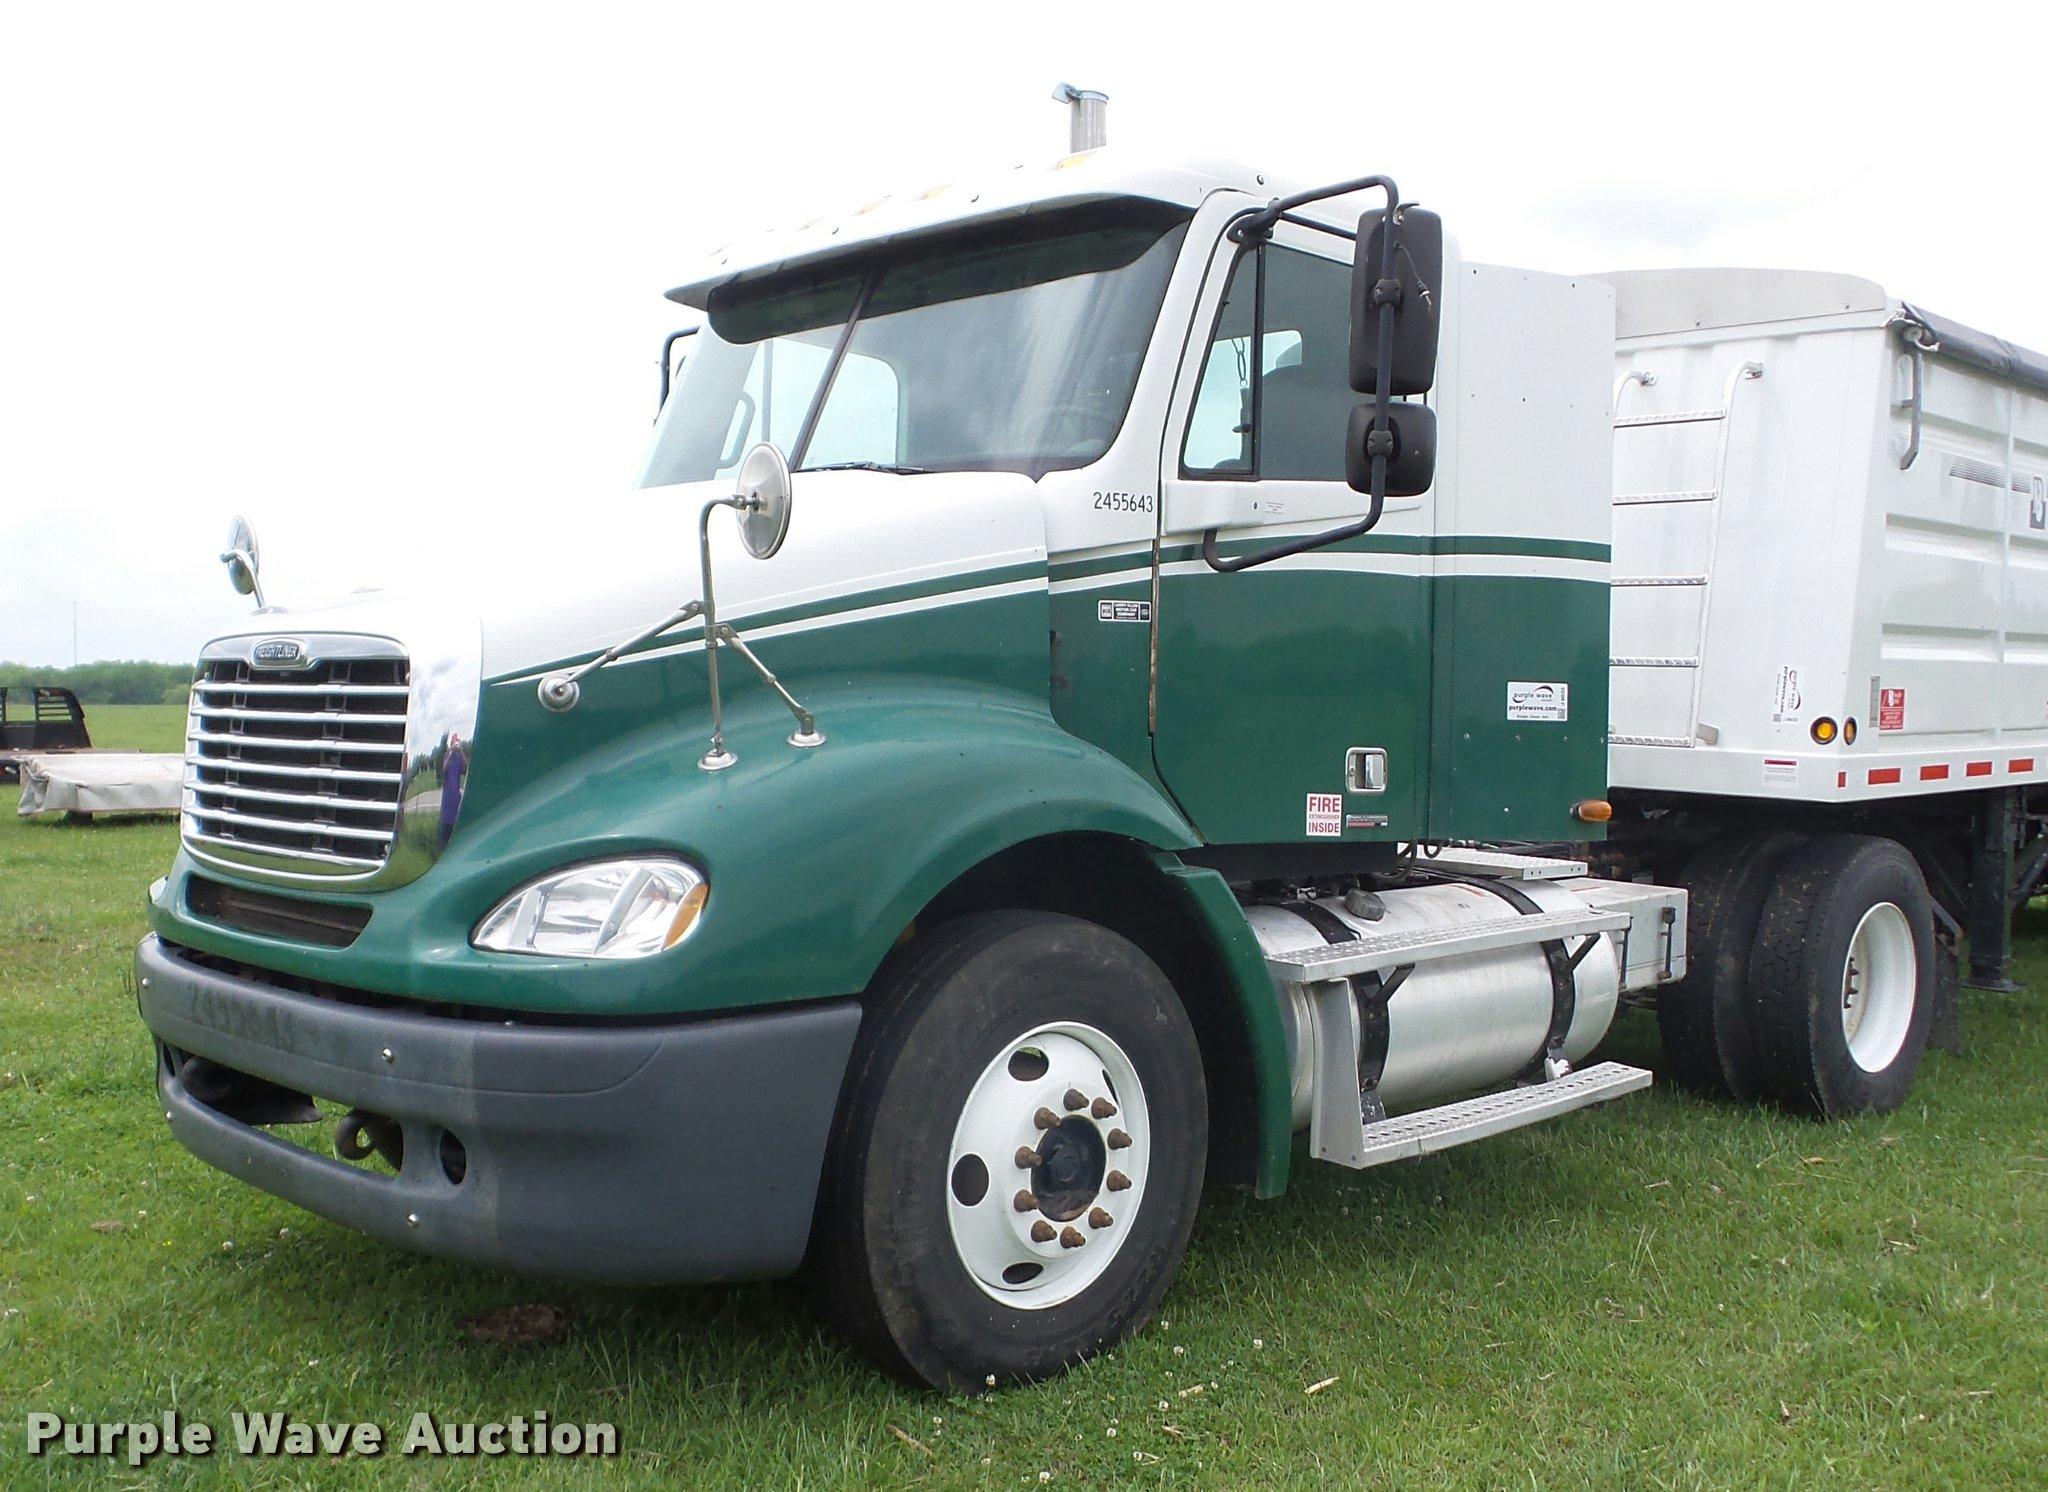 2005 Freightliner Columbia semi truck | Item J8633 | SOLD! M